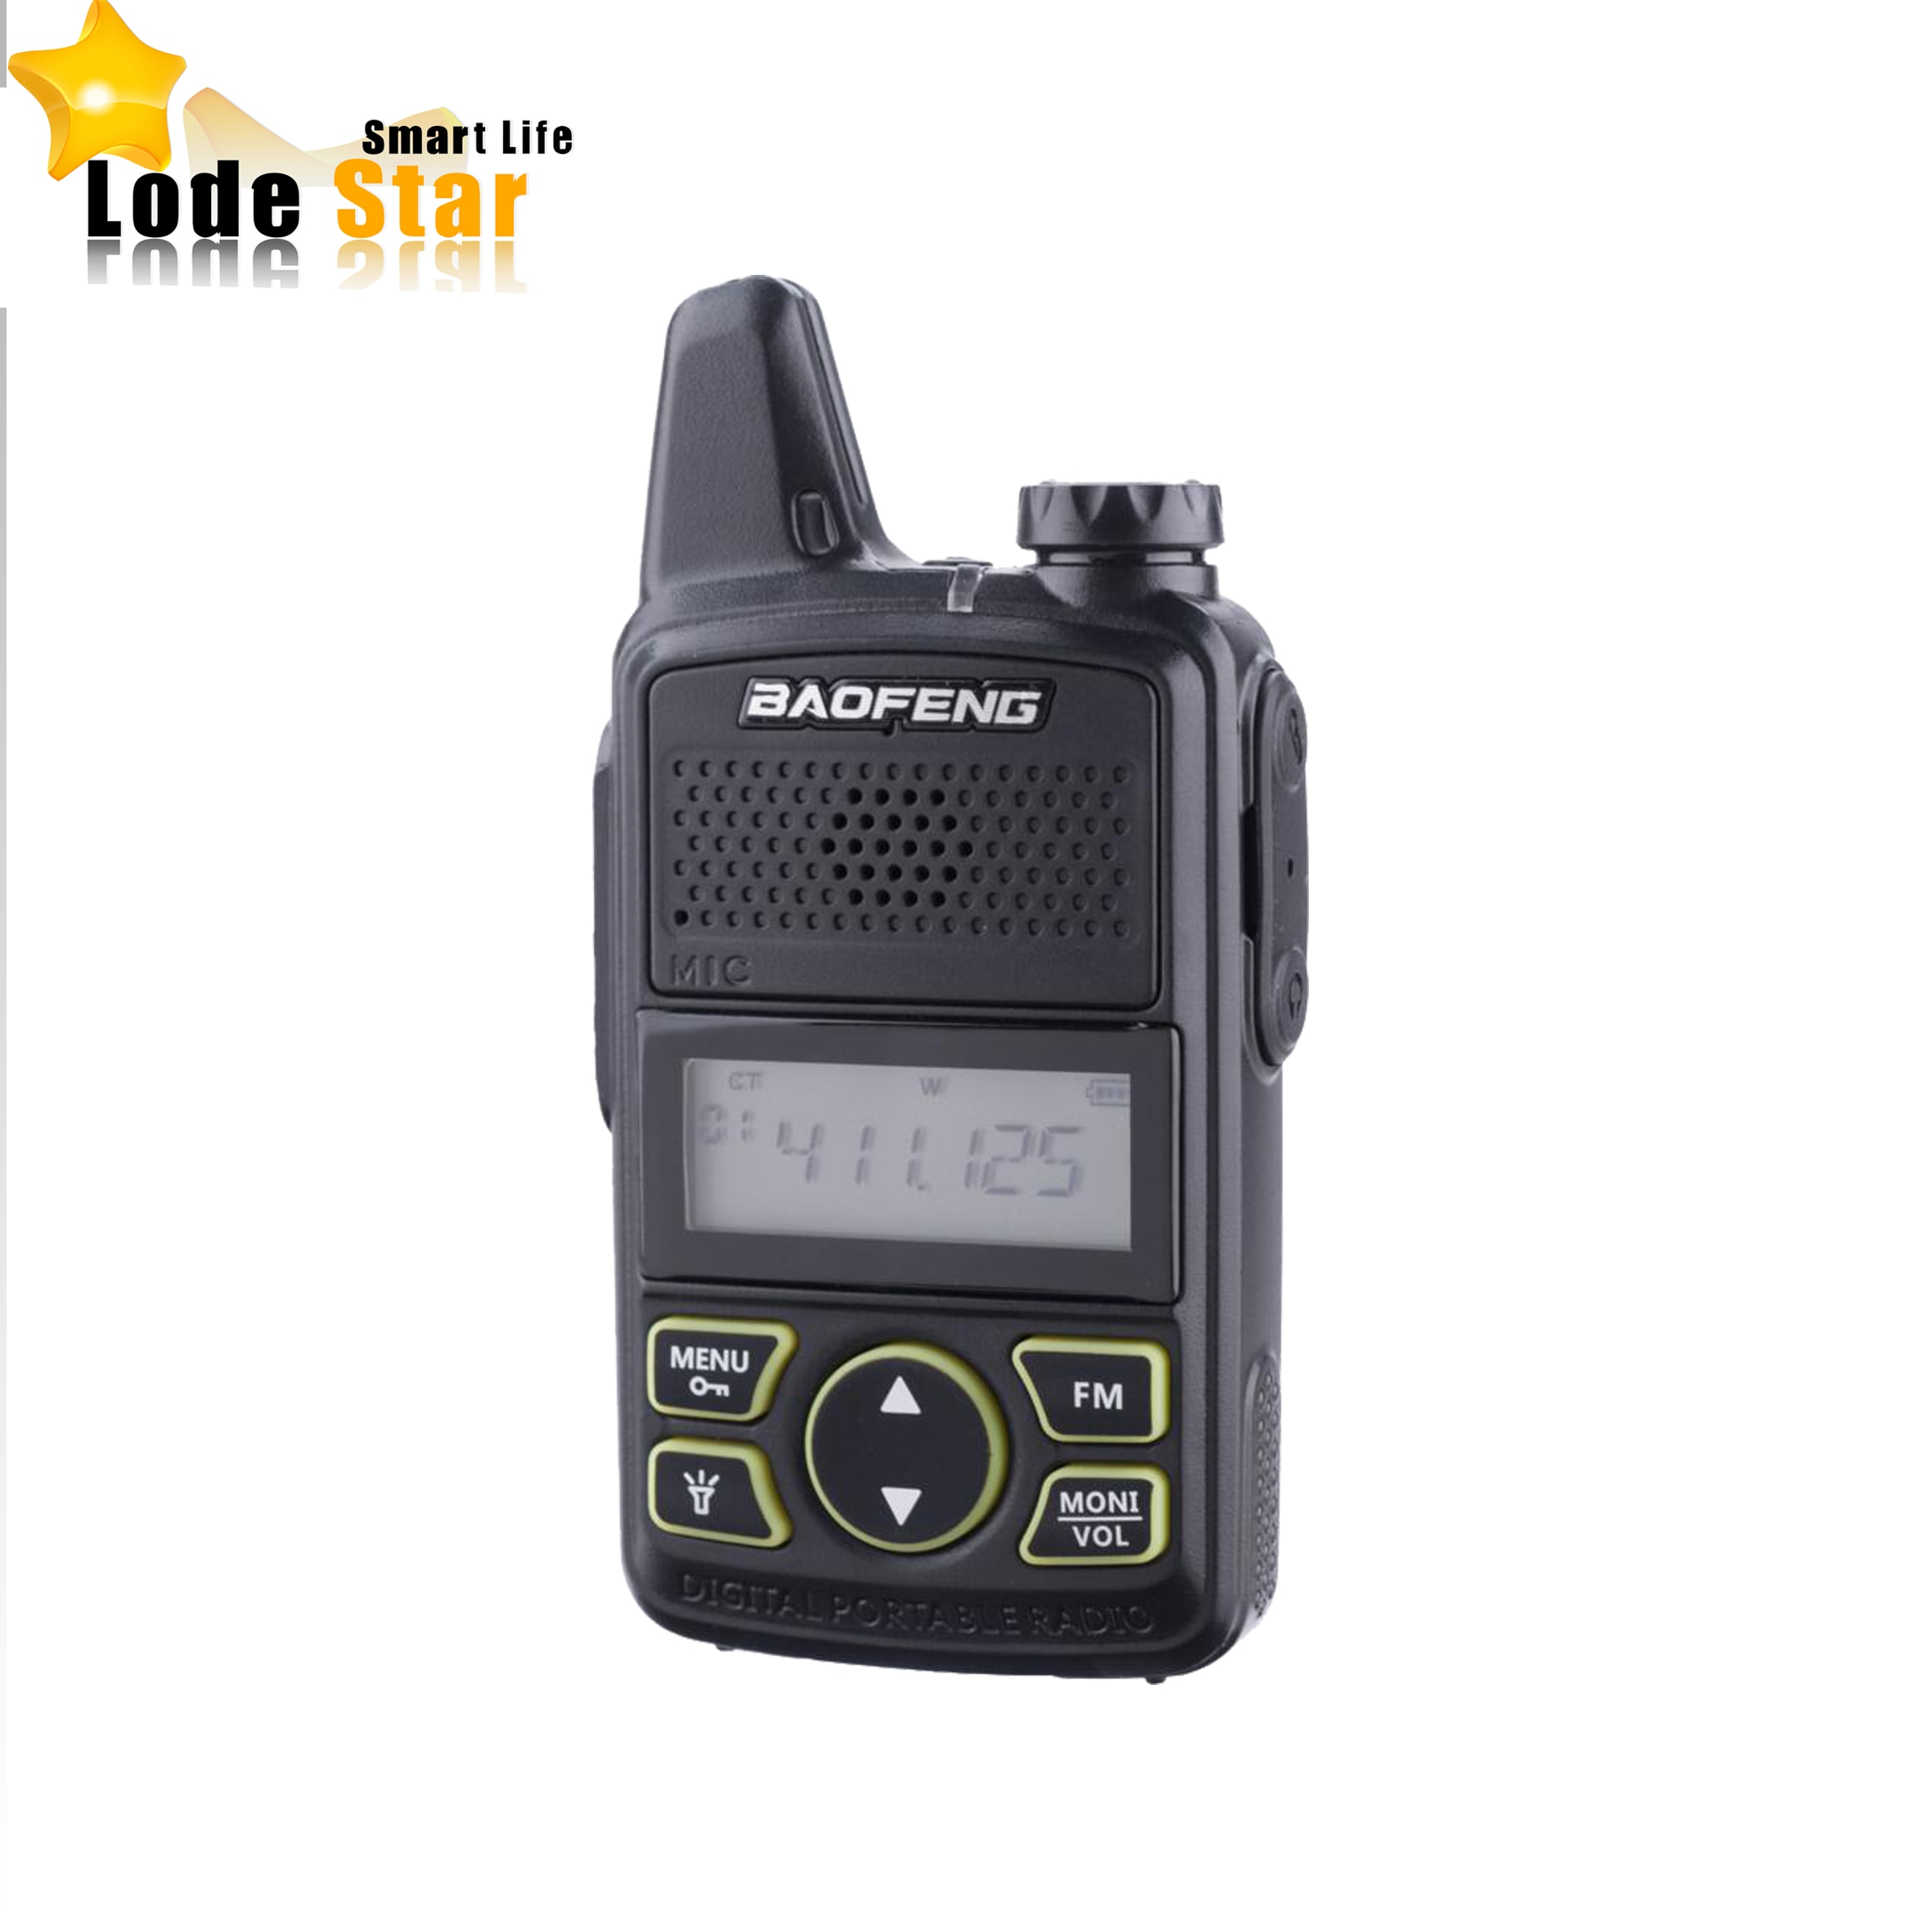 Walkie talkie baofeng t1 portátil, rádio bidirecional BF-T1 uhf 400-470mhz 20ch ham fm cb transmissor de rádio portátil